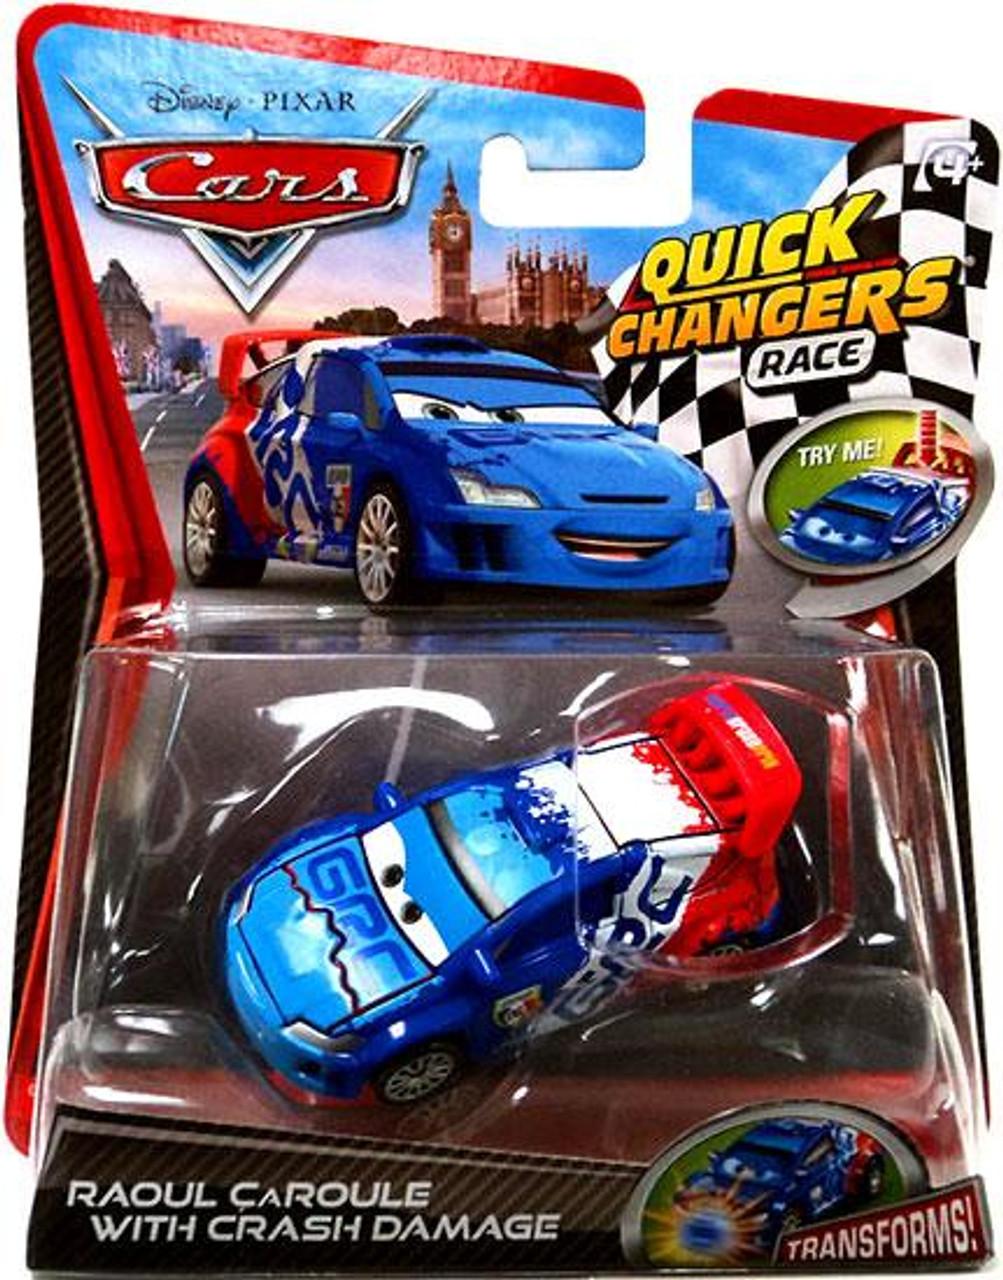 Disney Cars Cars 2 Quick Changers Race Raoul Caroule with Crash Damage Diecast Car